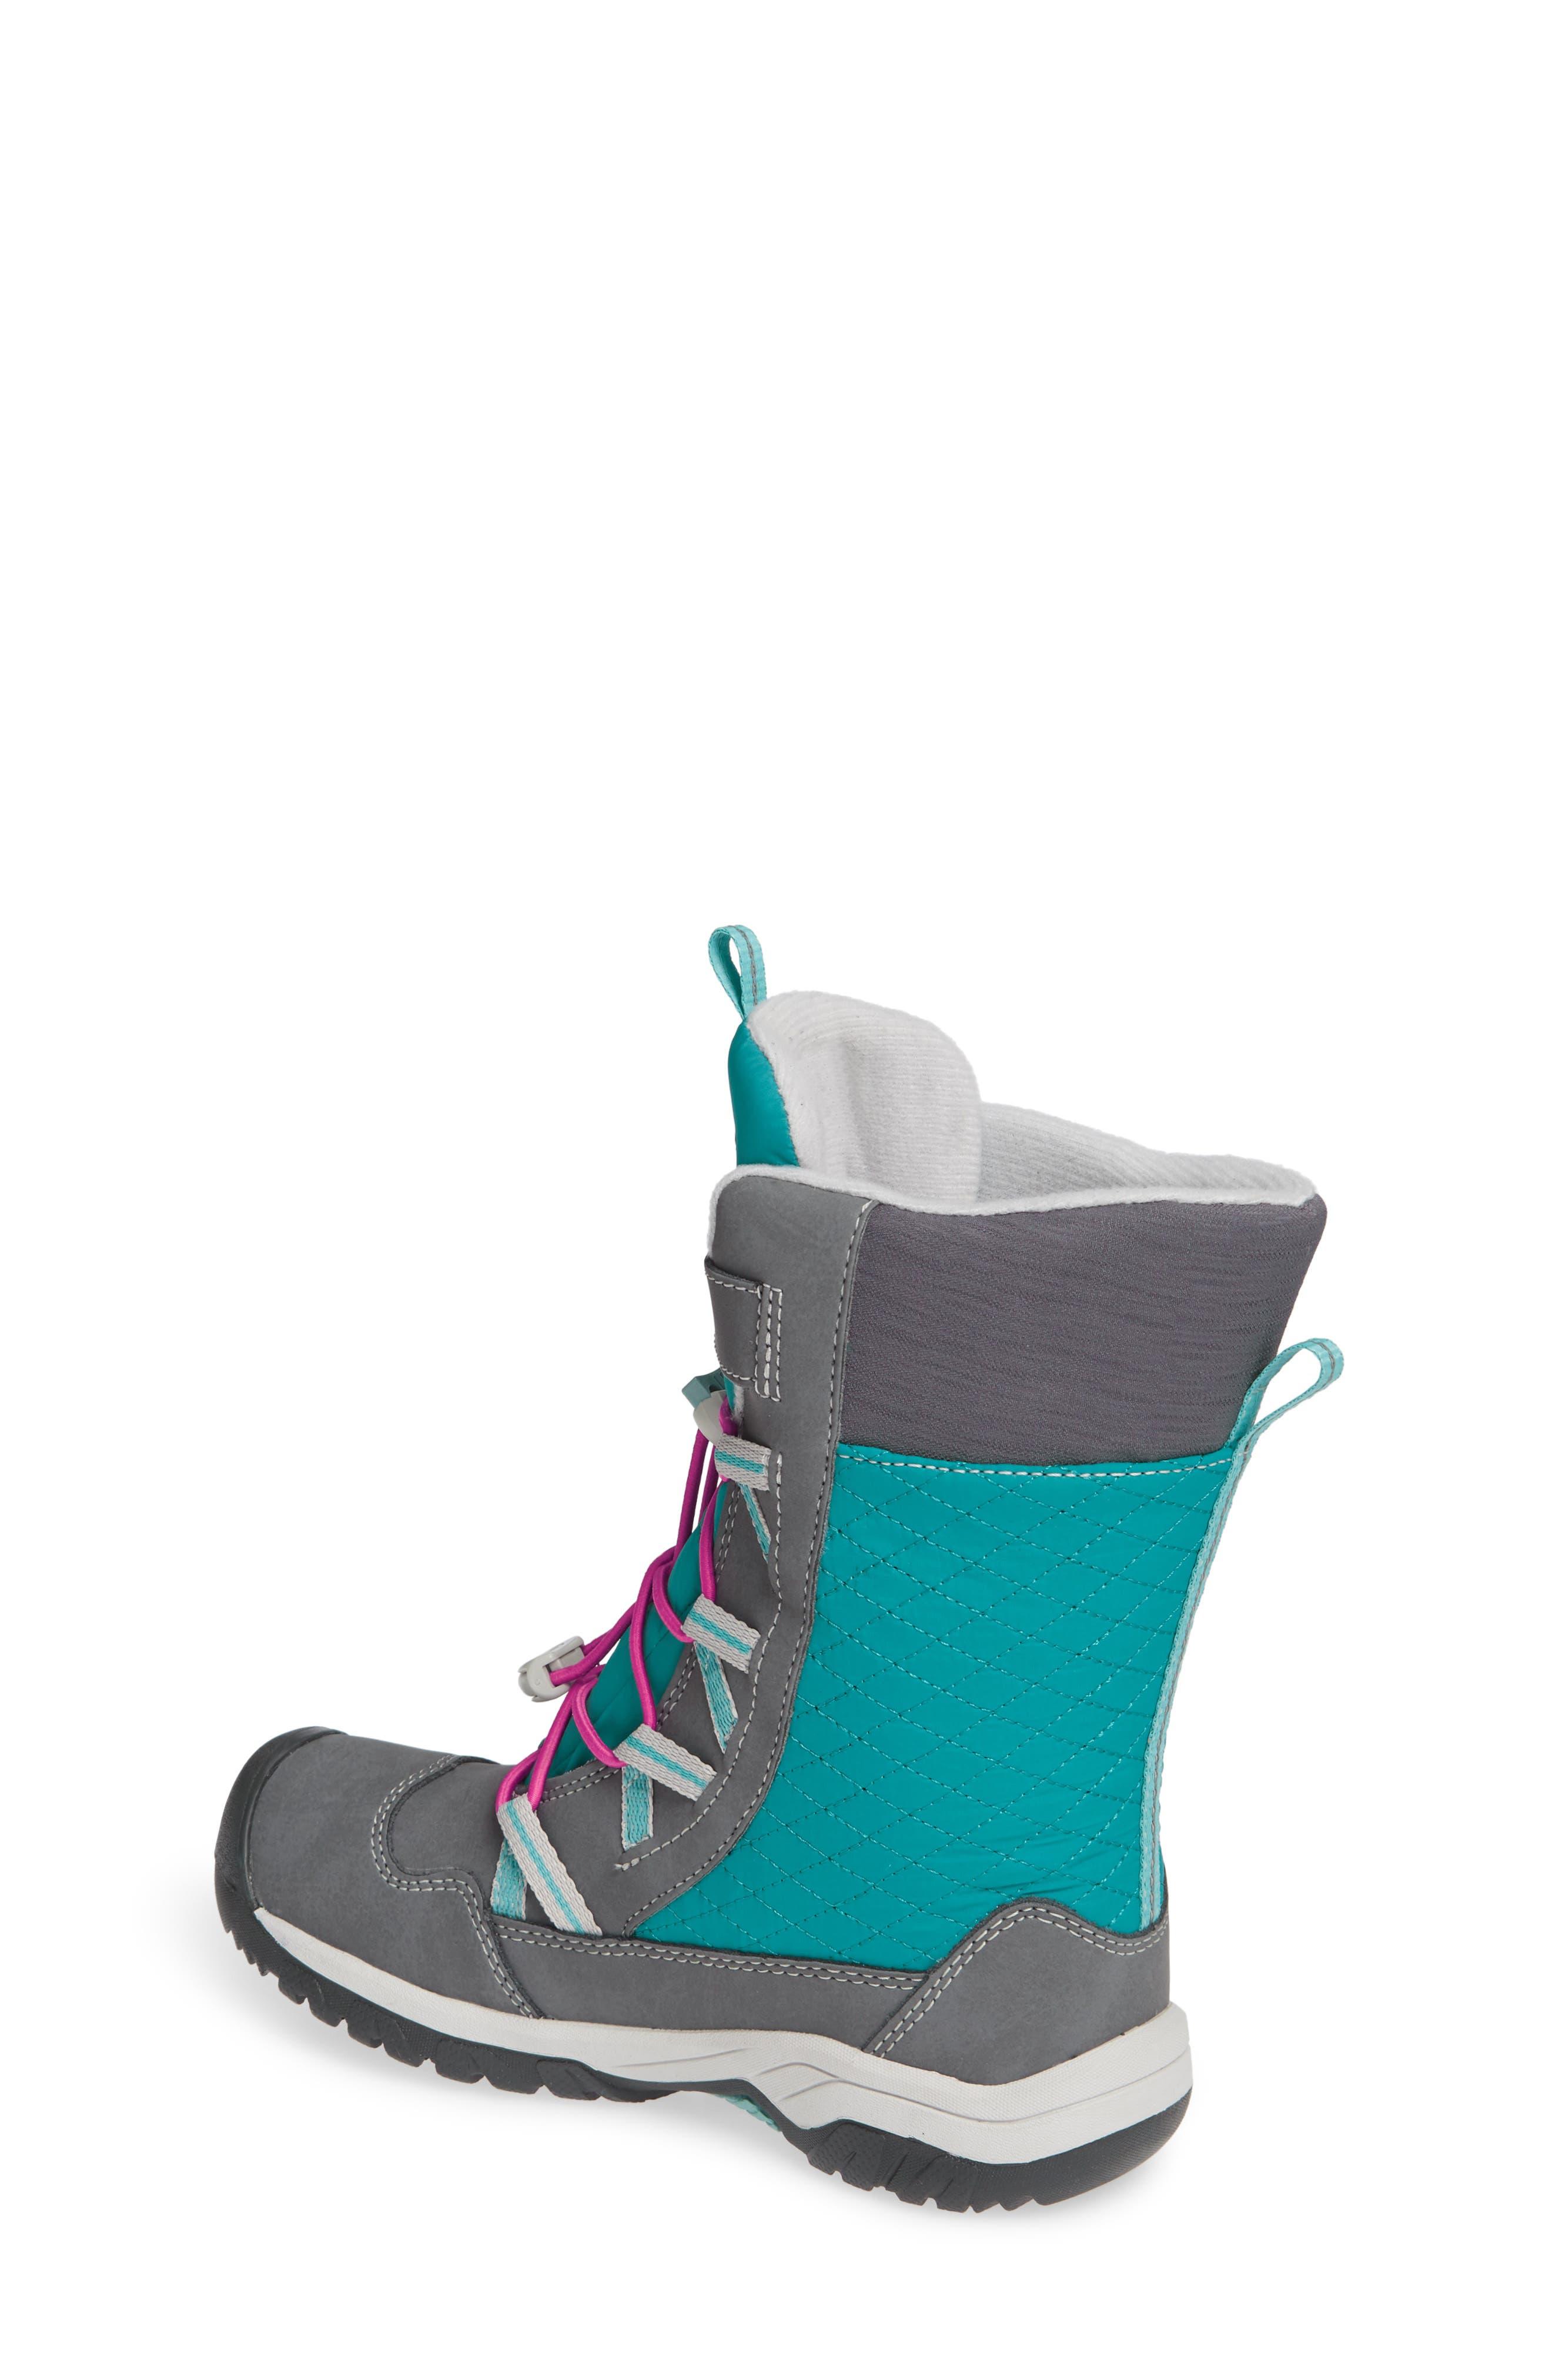 KEEN, Hoodoo Waterproof Insulated Boot, Alternate thumbnail 2, color, STEEL GREY/ CABARET